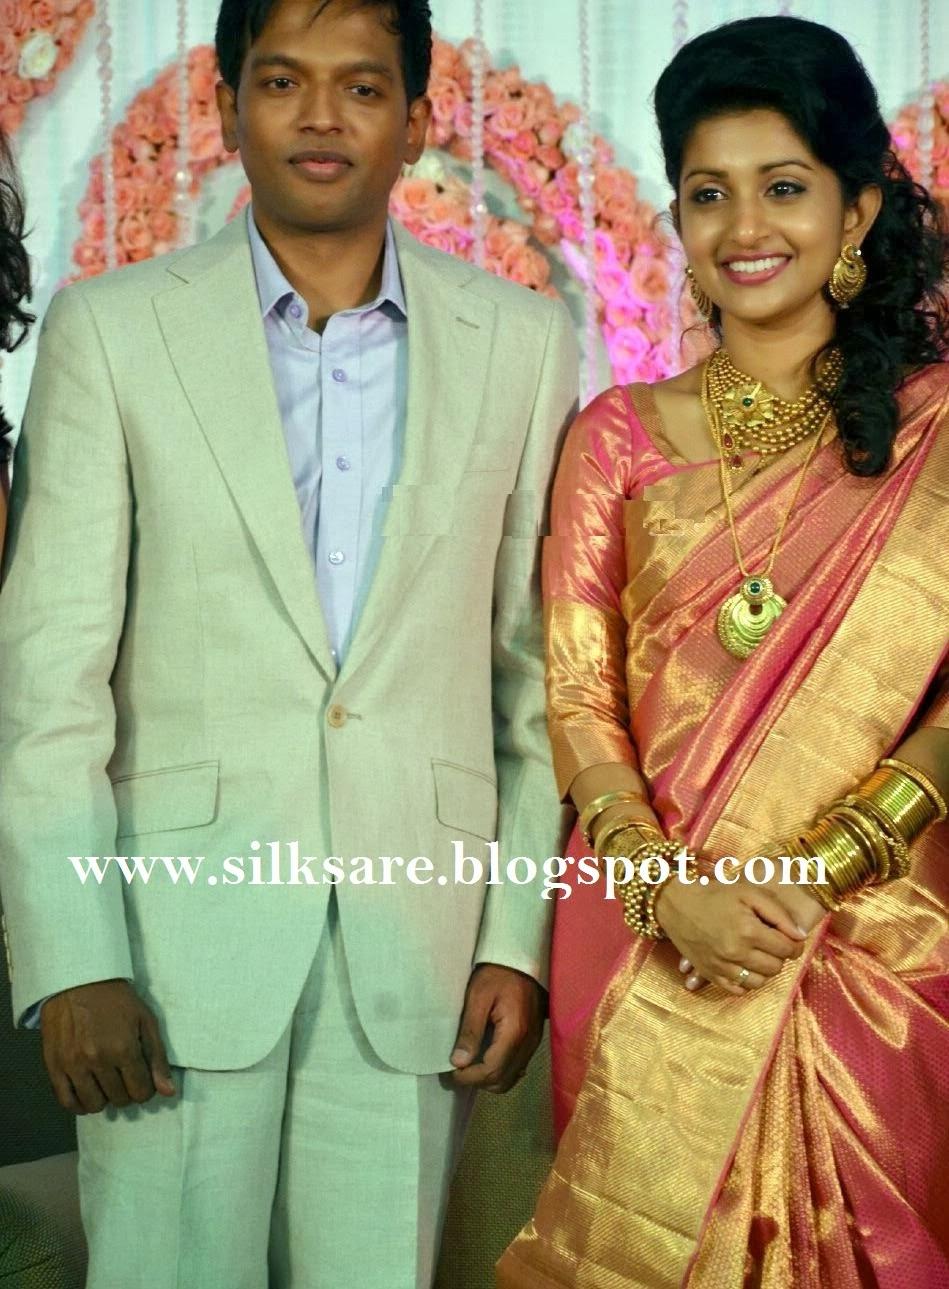 LATEST INDIAN WEDDING SILK SAREEJEWELLERYWEDDING HAIR STYLE